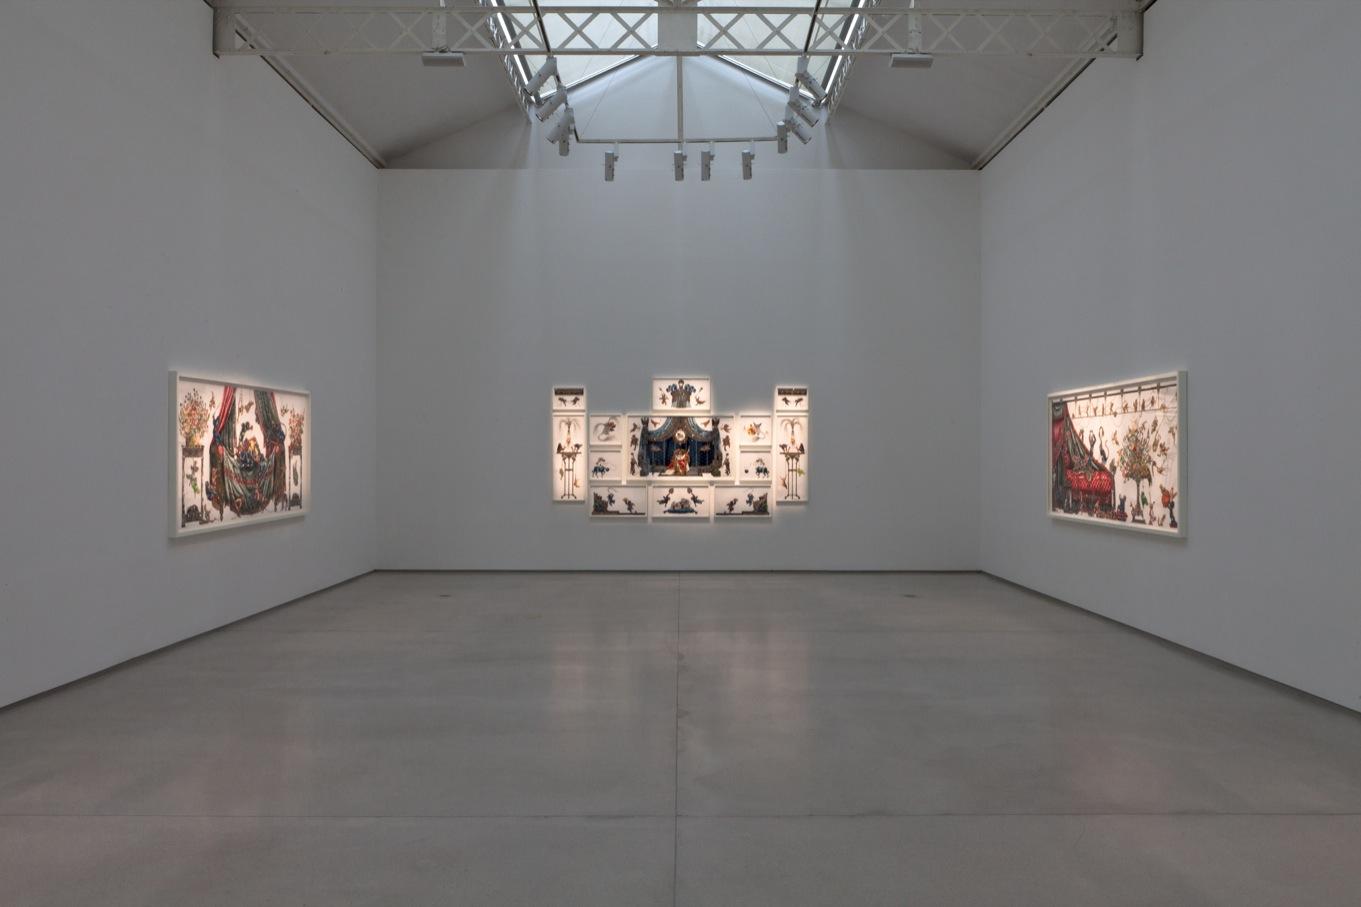 Exposition de Raqib Shaw à la galerie Thaddaeus Ropac